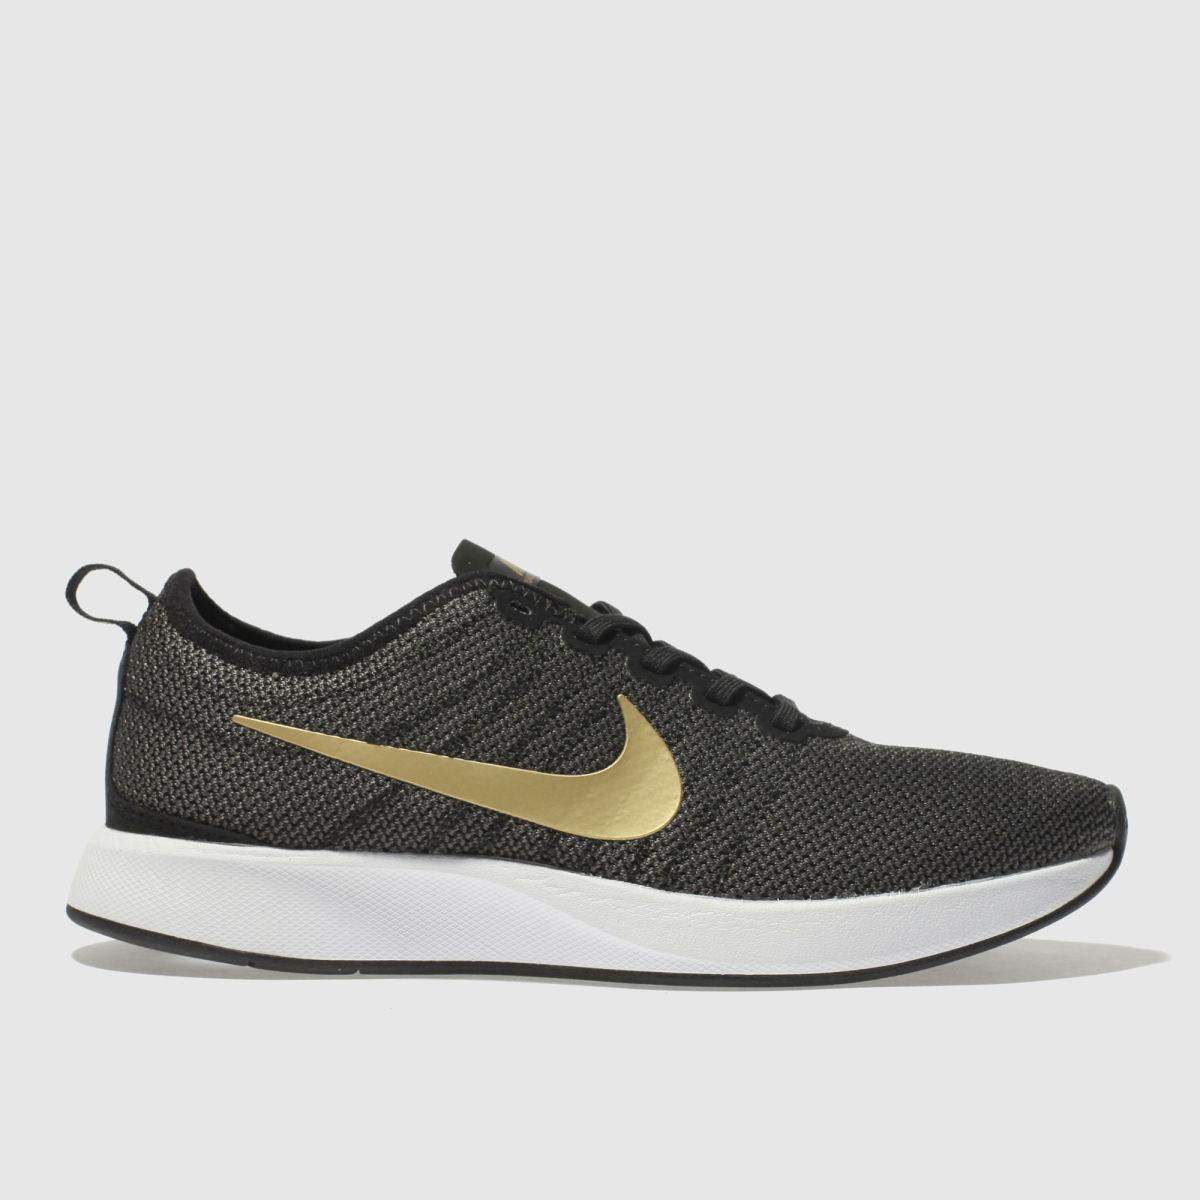 Nike Black & Gold Dualtone Racer Se Trainers